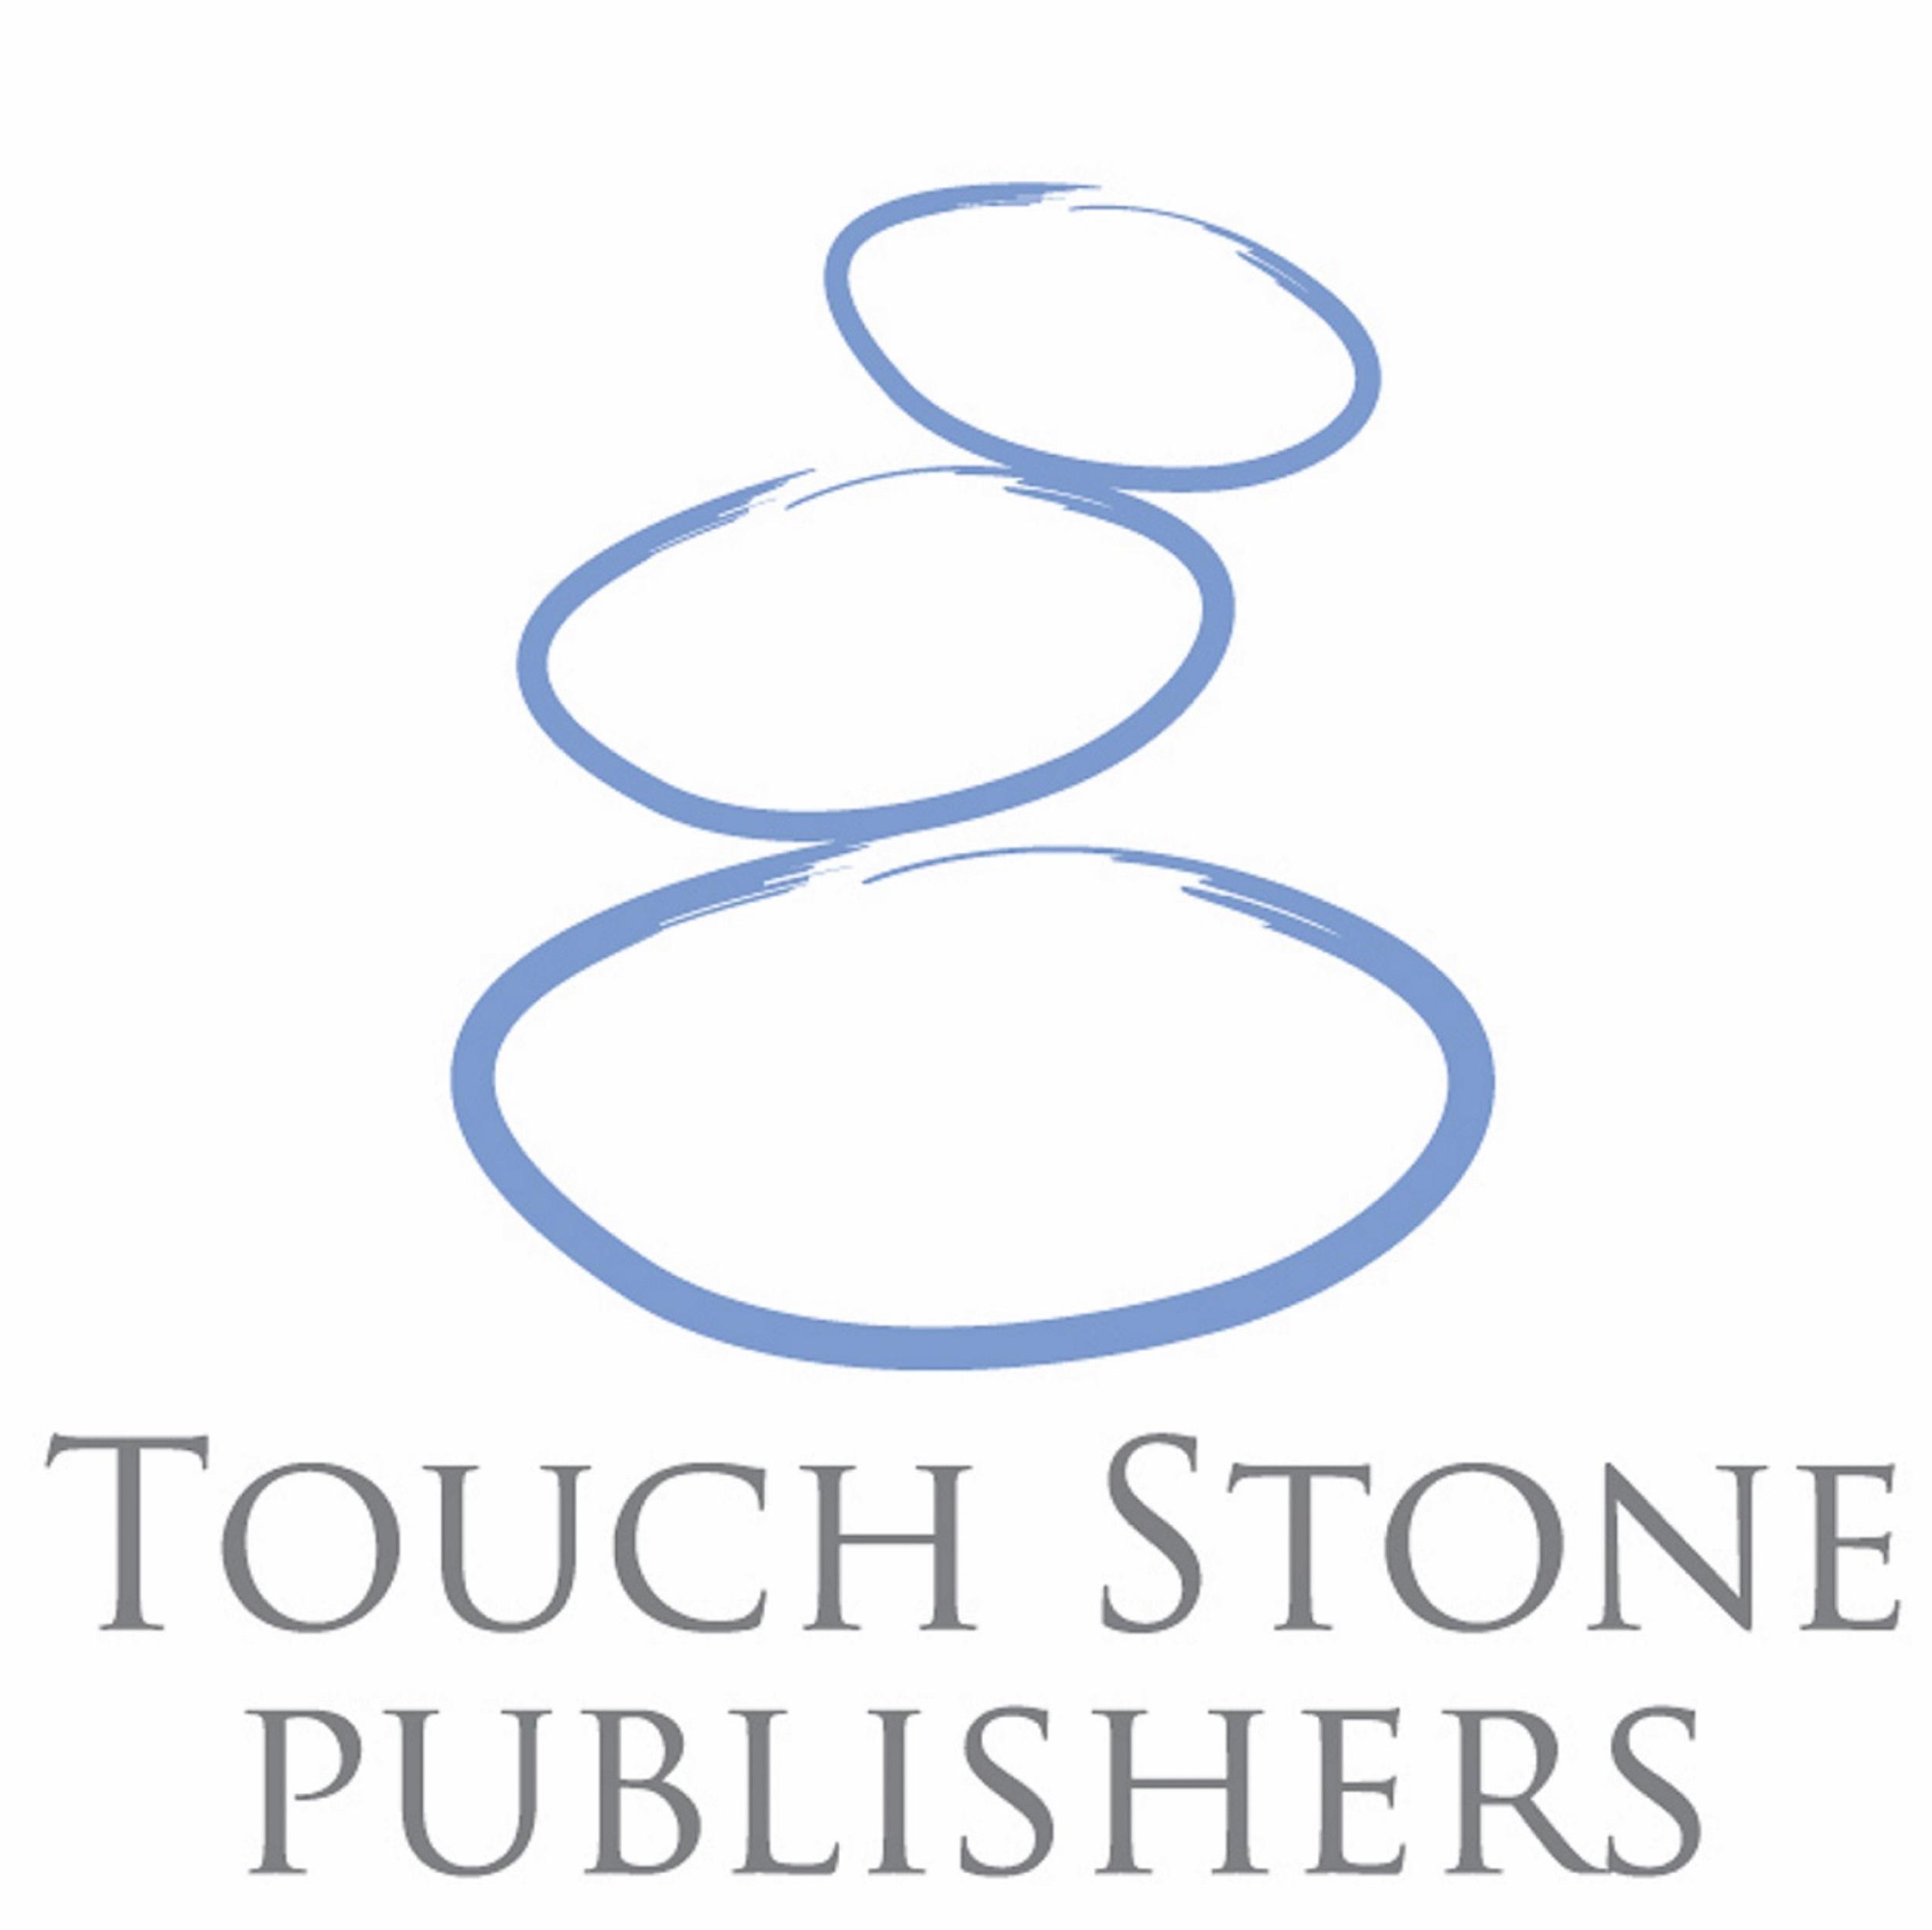 Touch Stone Publishers LTD